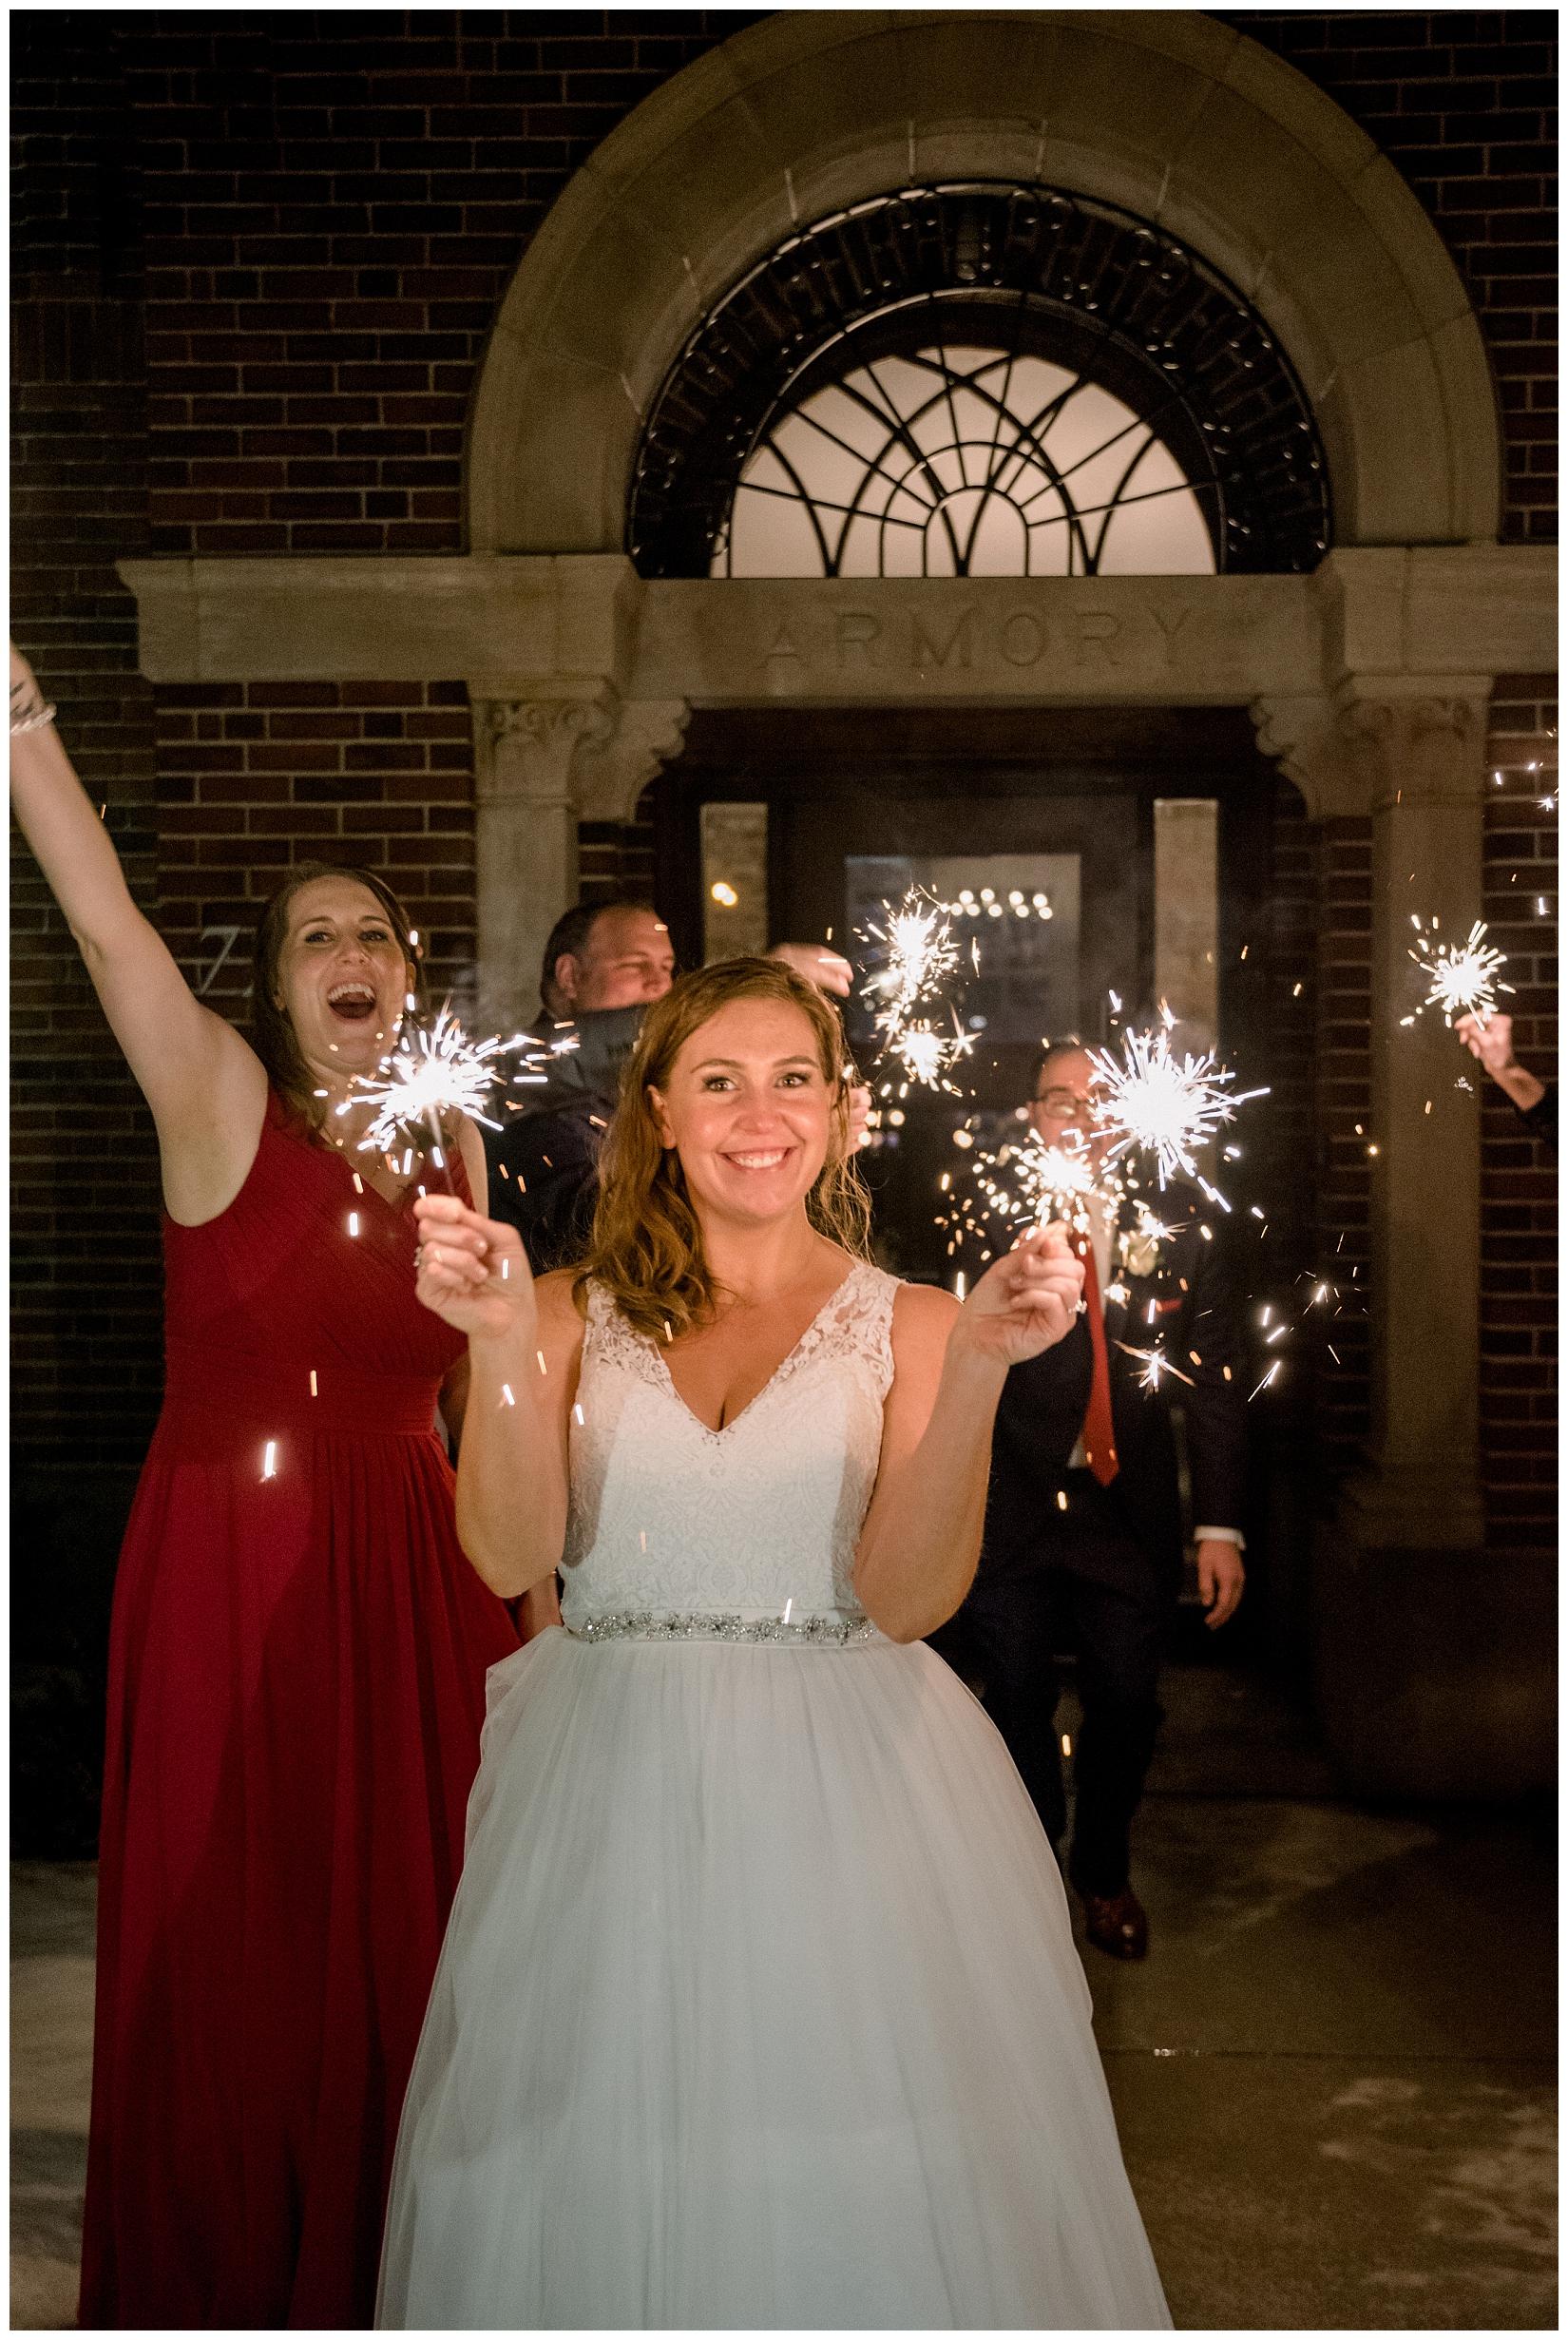 cat-alkire-wedding-photographer-indiana-chicago-indianapolis-fort-wayne_1018.jpg